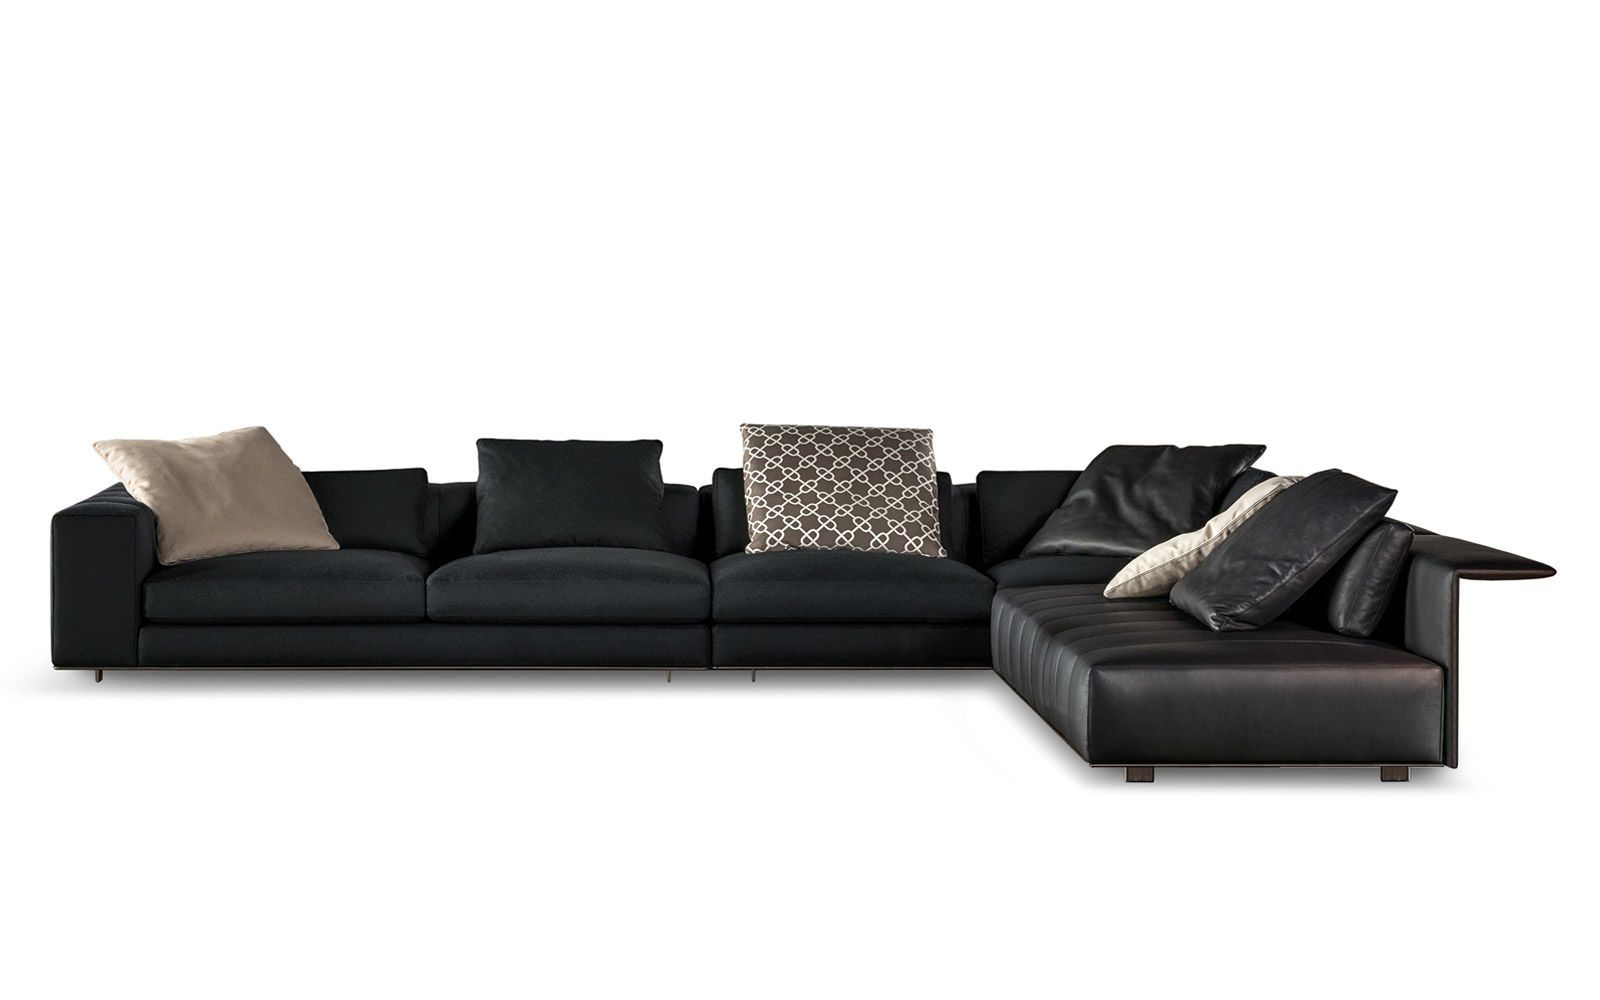 Freeman Seating System Sofas En Sofa Sofa Modular Sofa Modern Sofa